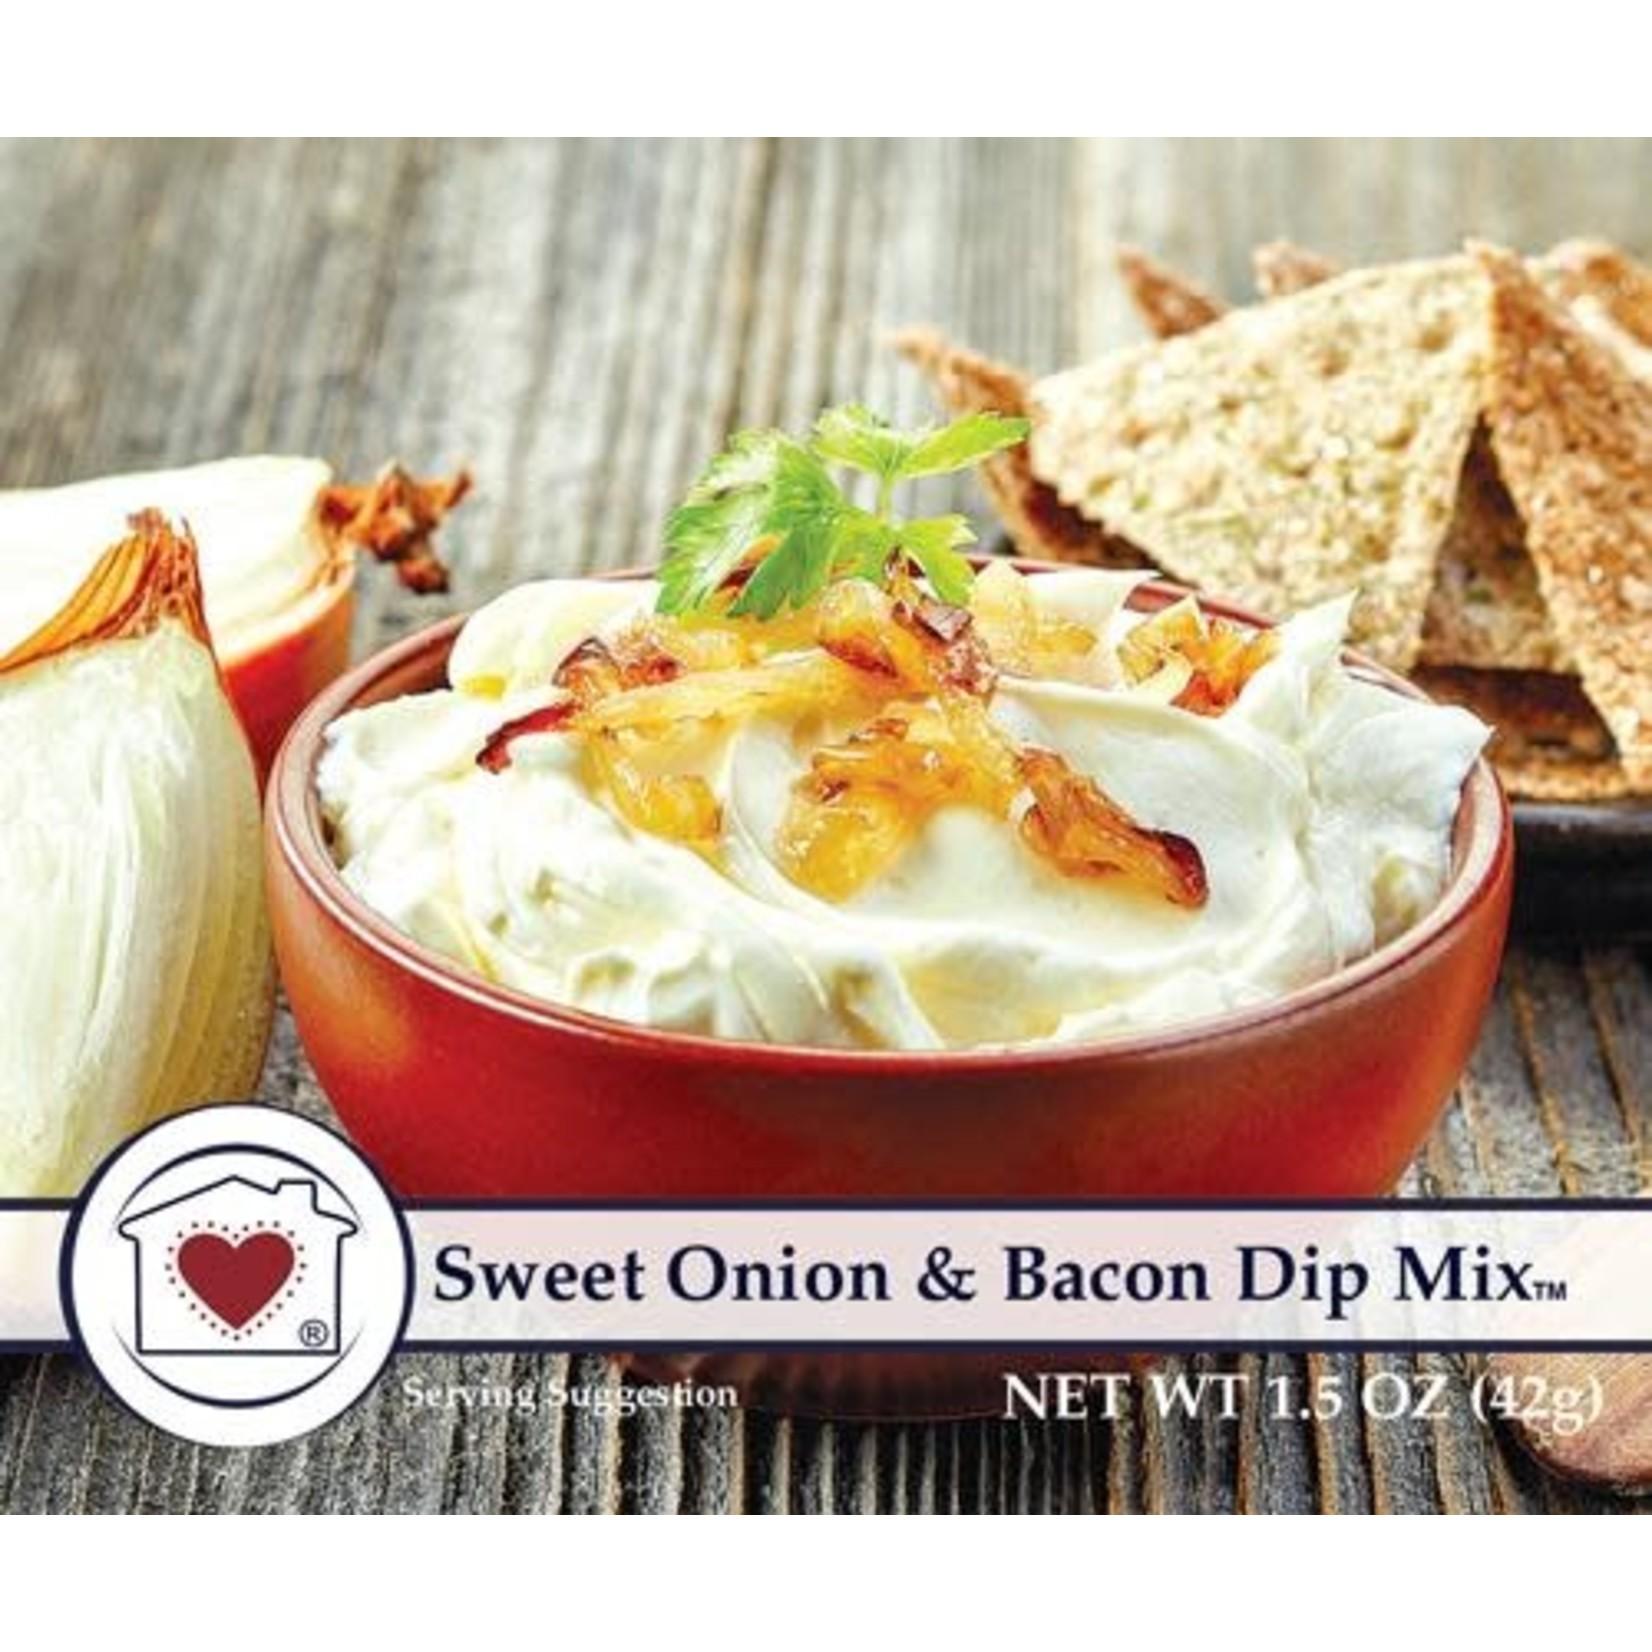 SWEET ONION & BACON DIP MIX